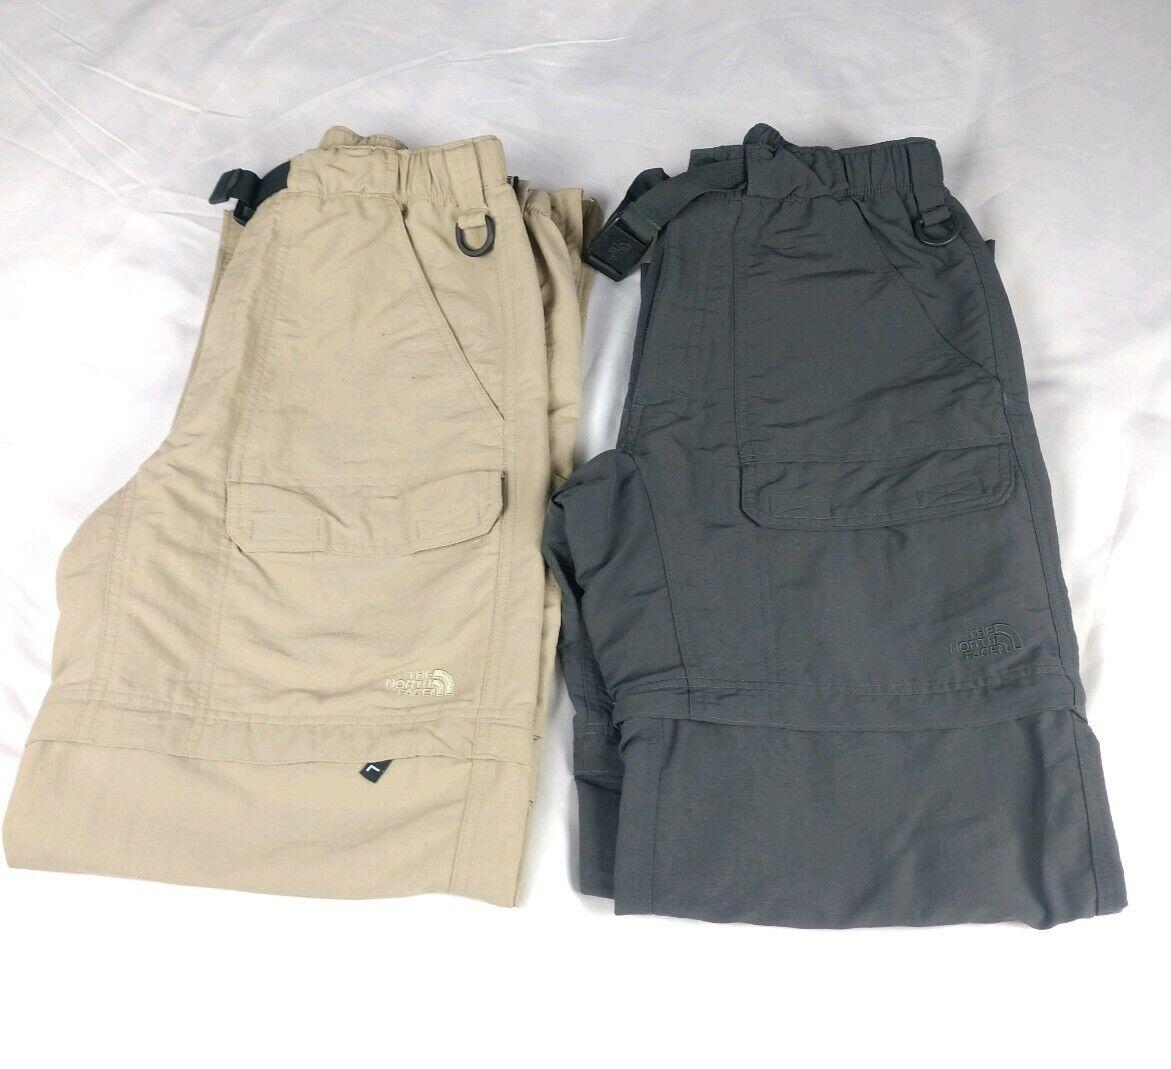 2 PAIR North Face Mens S ConGrünible Zip Off grau Tan Hiking Pants Shorts Cargo